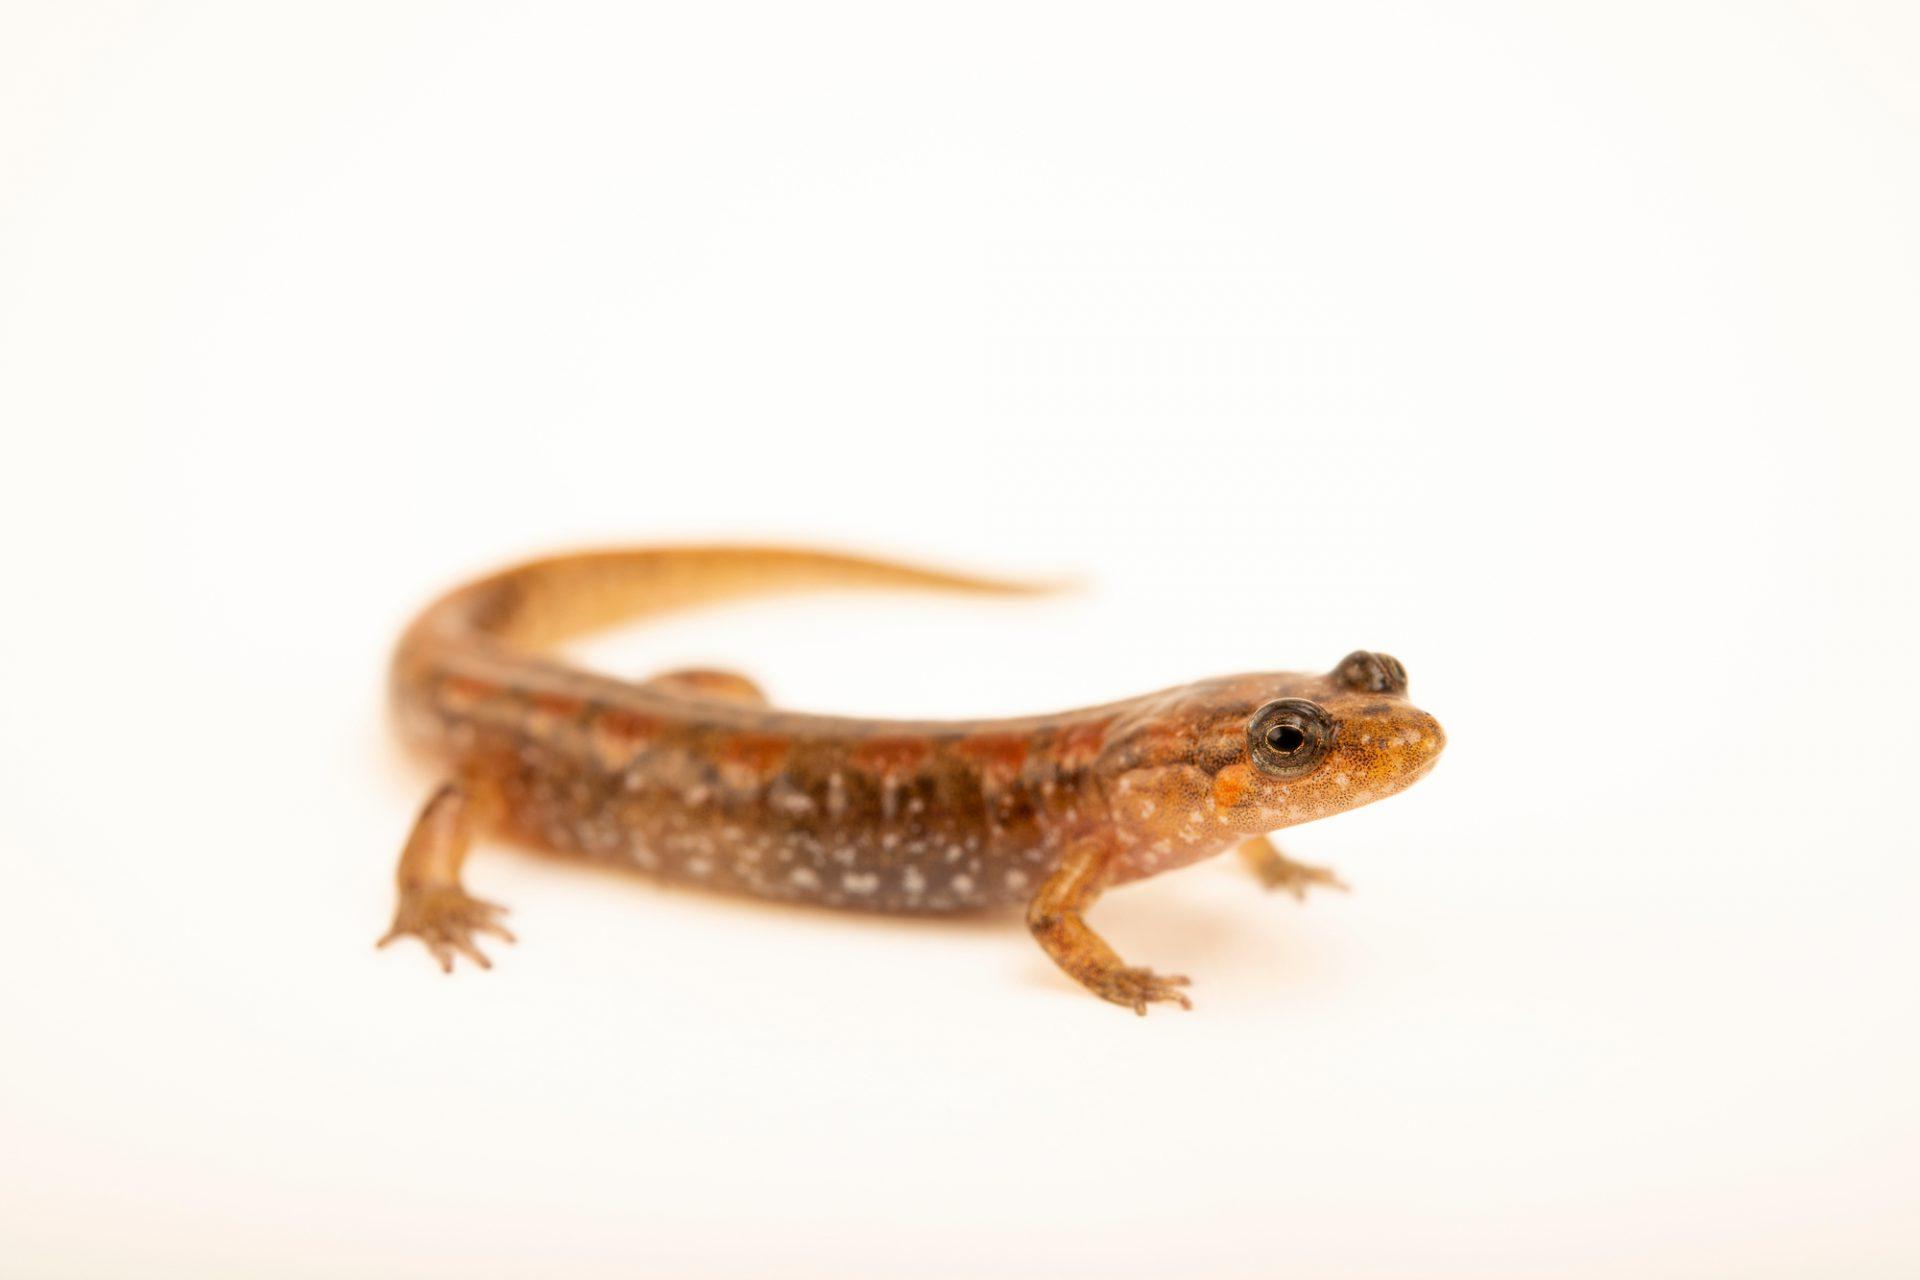 Photo: A spotted dusky salamander (Desmognathus conanti) at the Auburn University Natural History Museum.